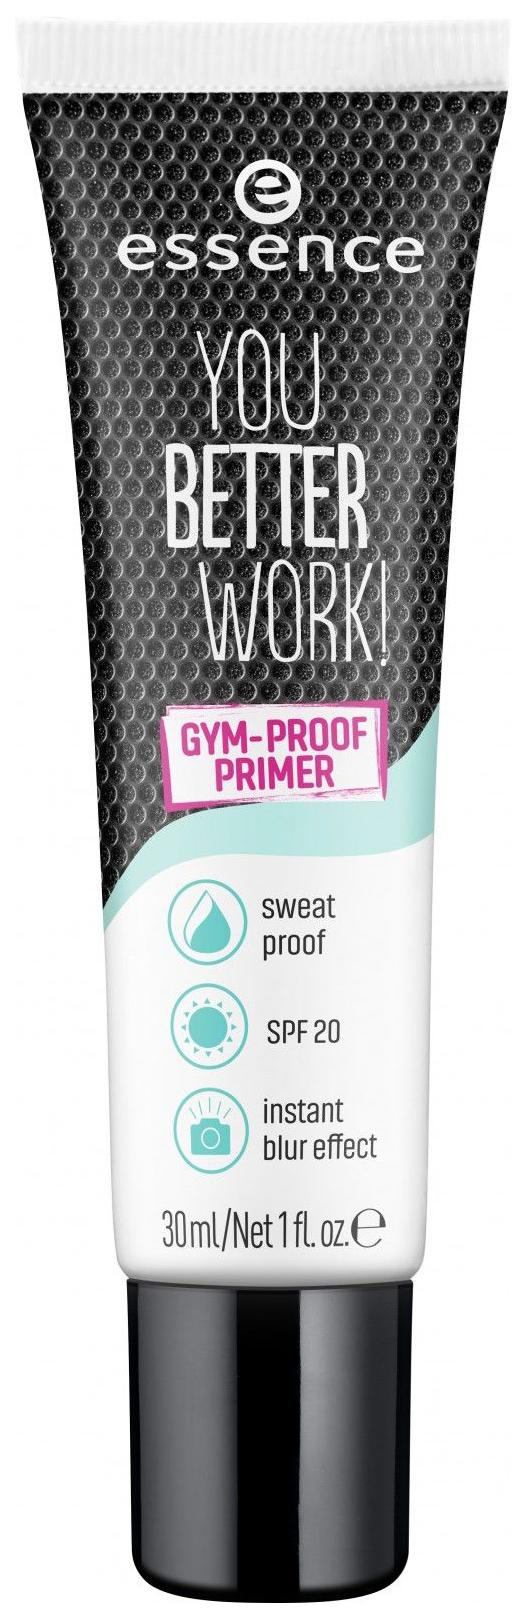 Основа для макияжа Essence You Better Work!